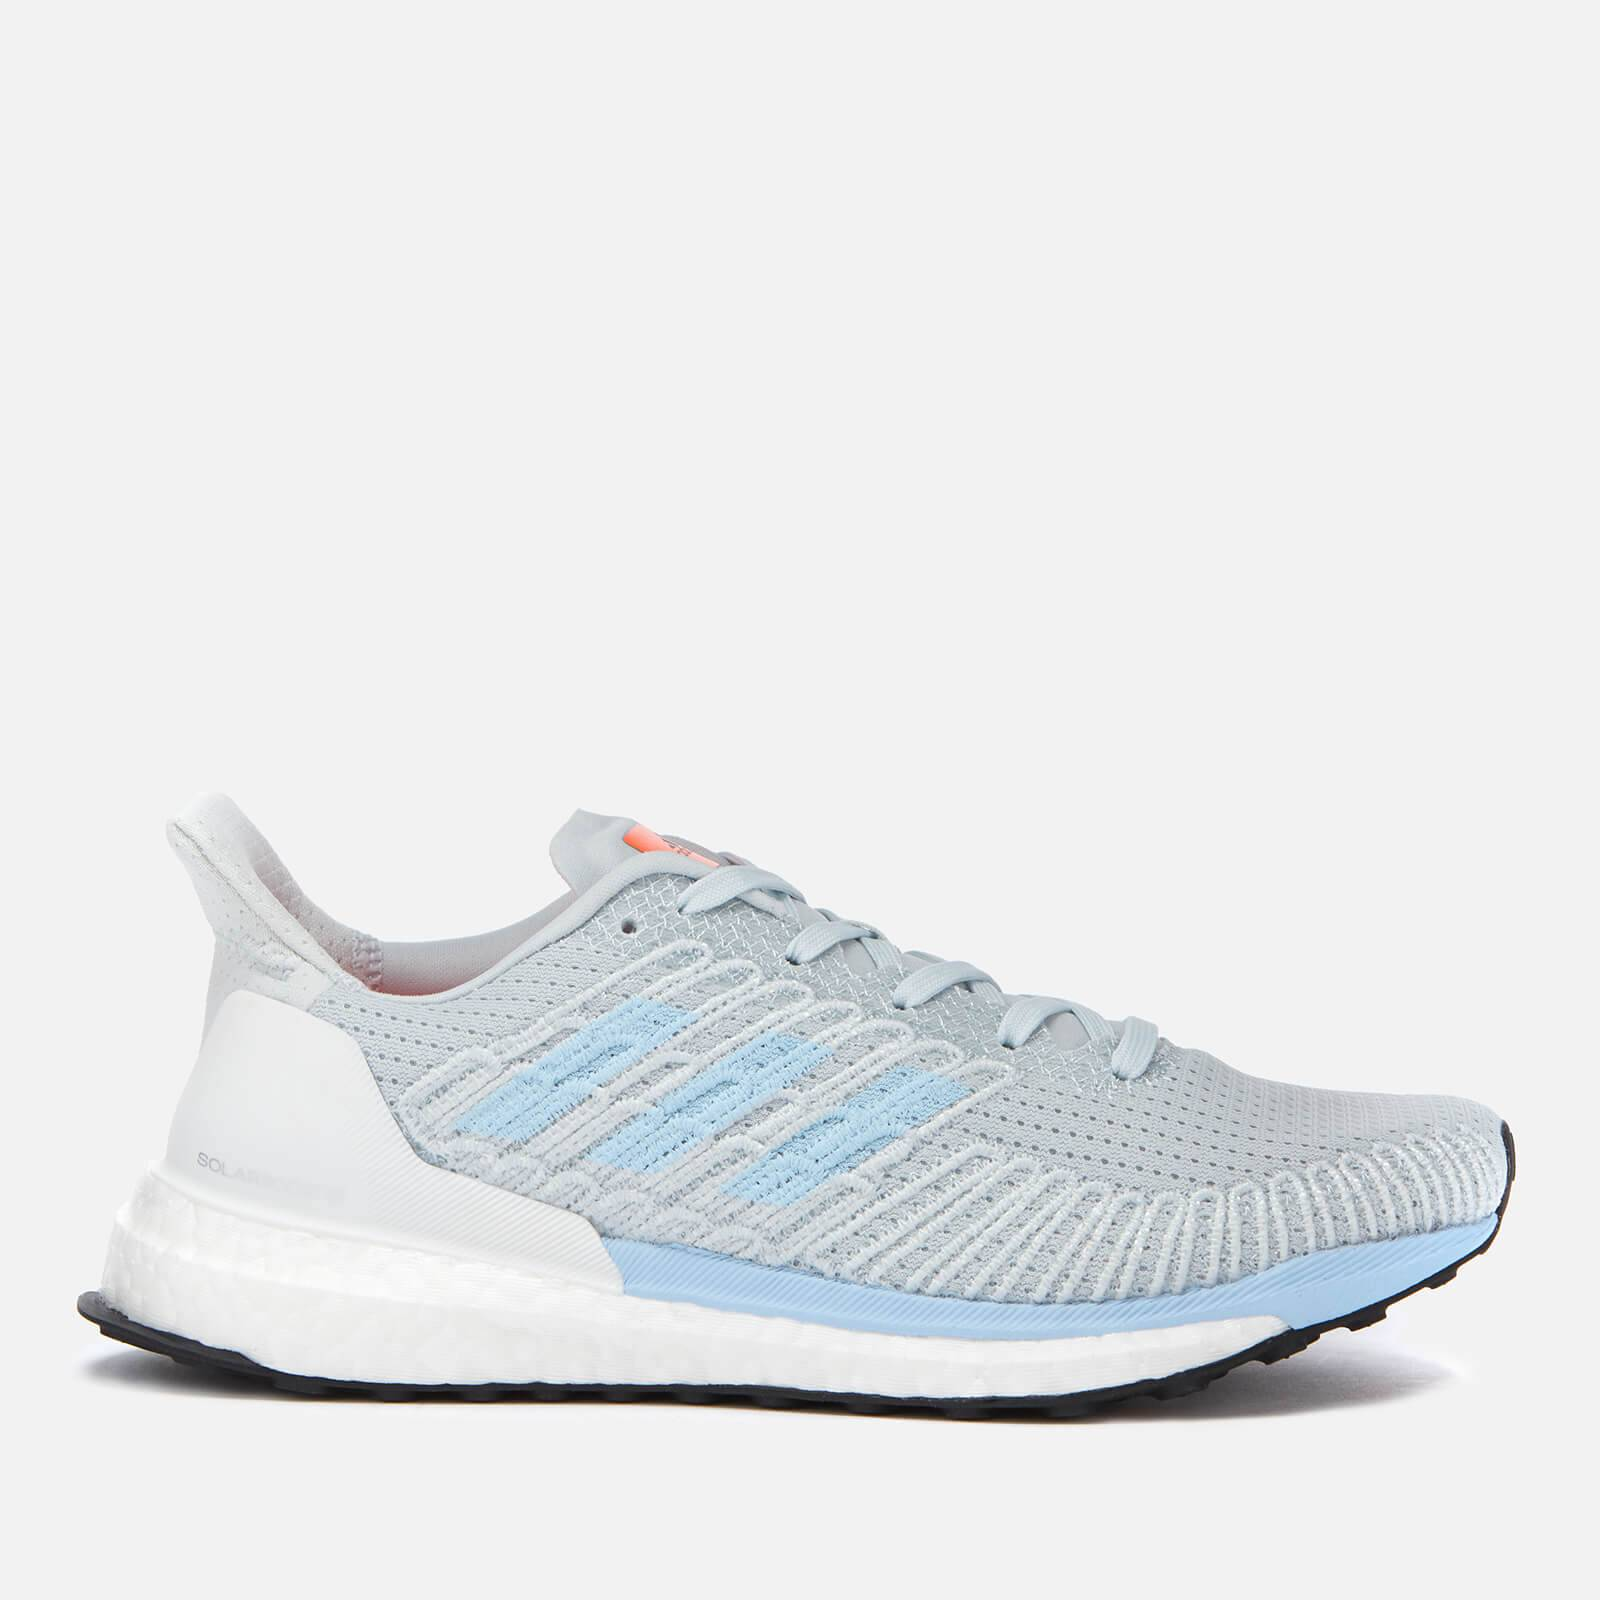 adidas Women's Solar Boost St Trainers - Blue - UK 4 - Blue